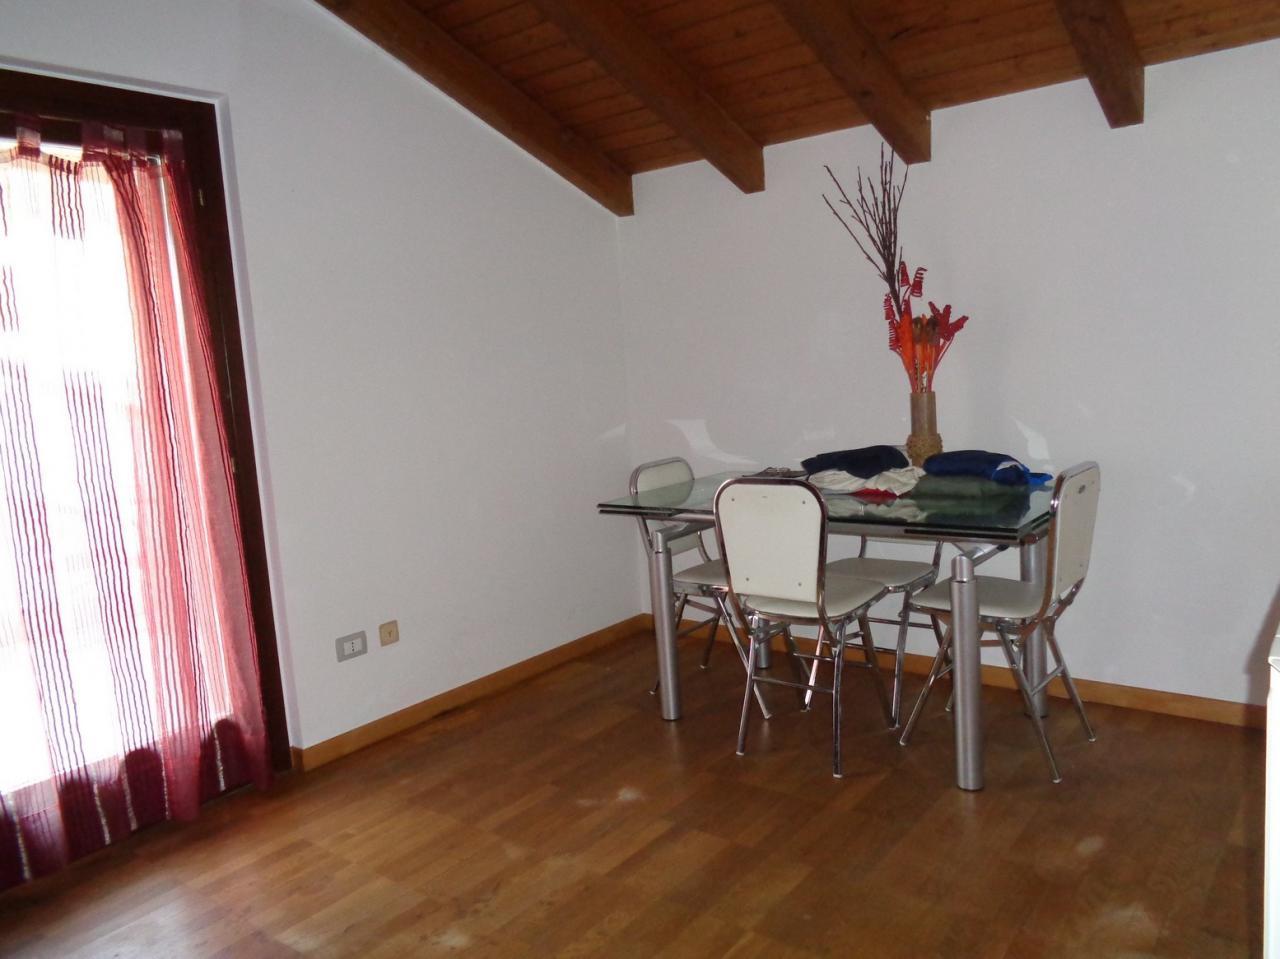 Bilocale Casale Litta Via Verdi 3